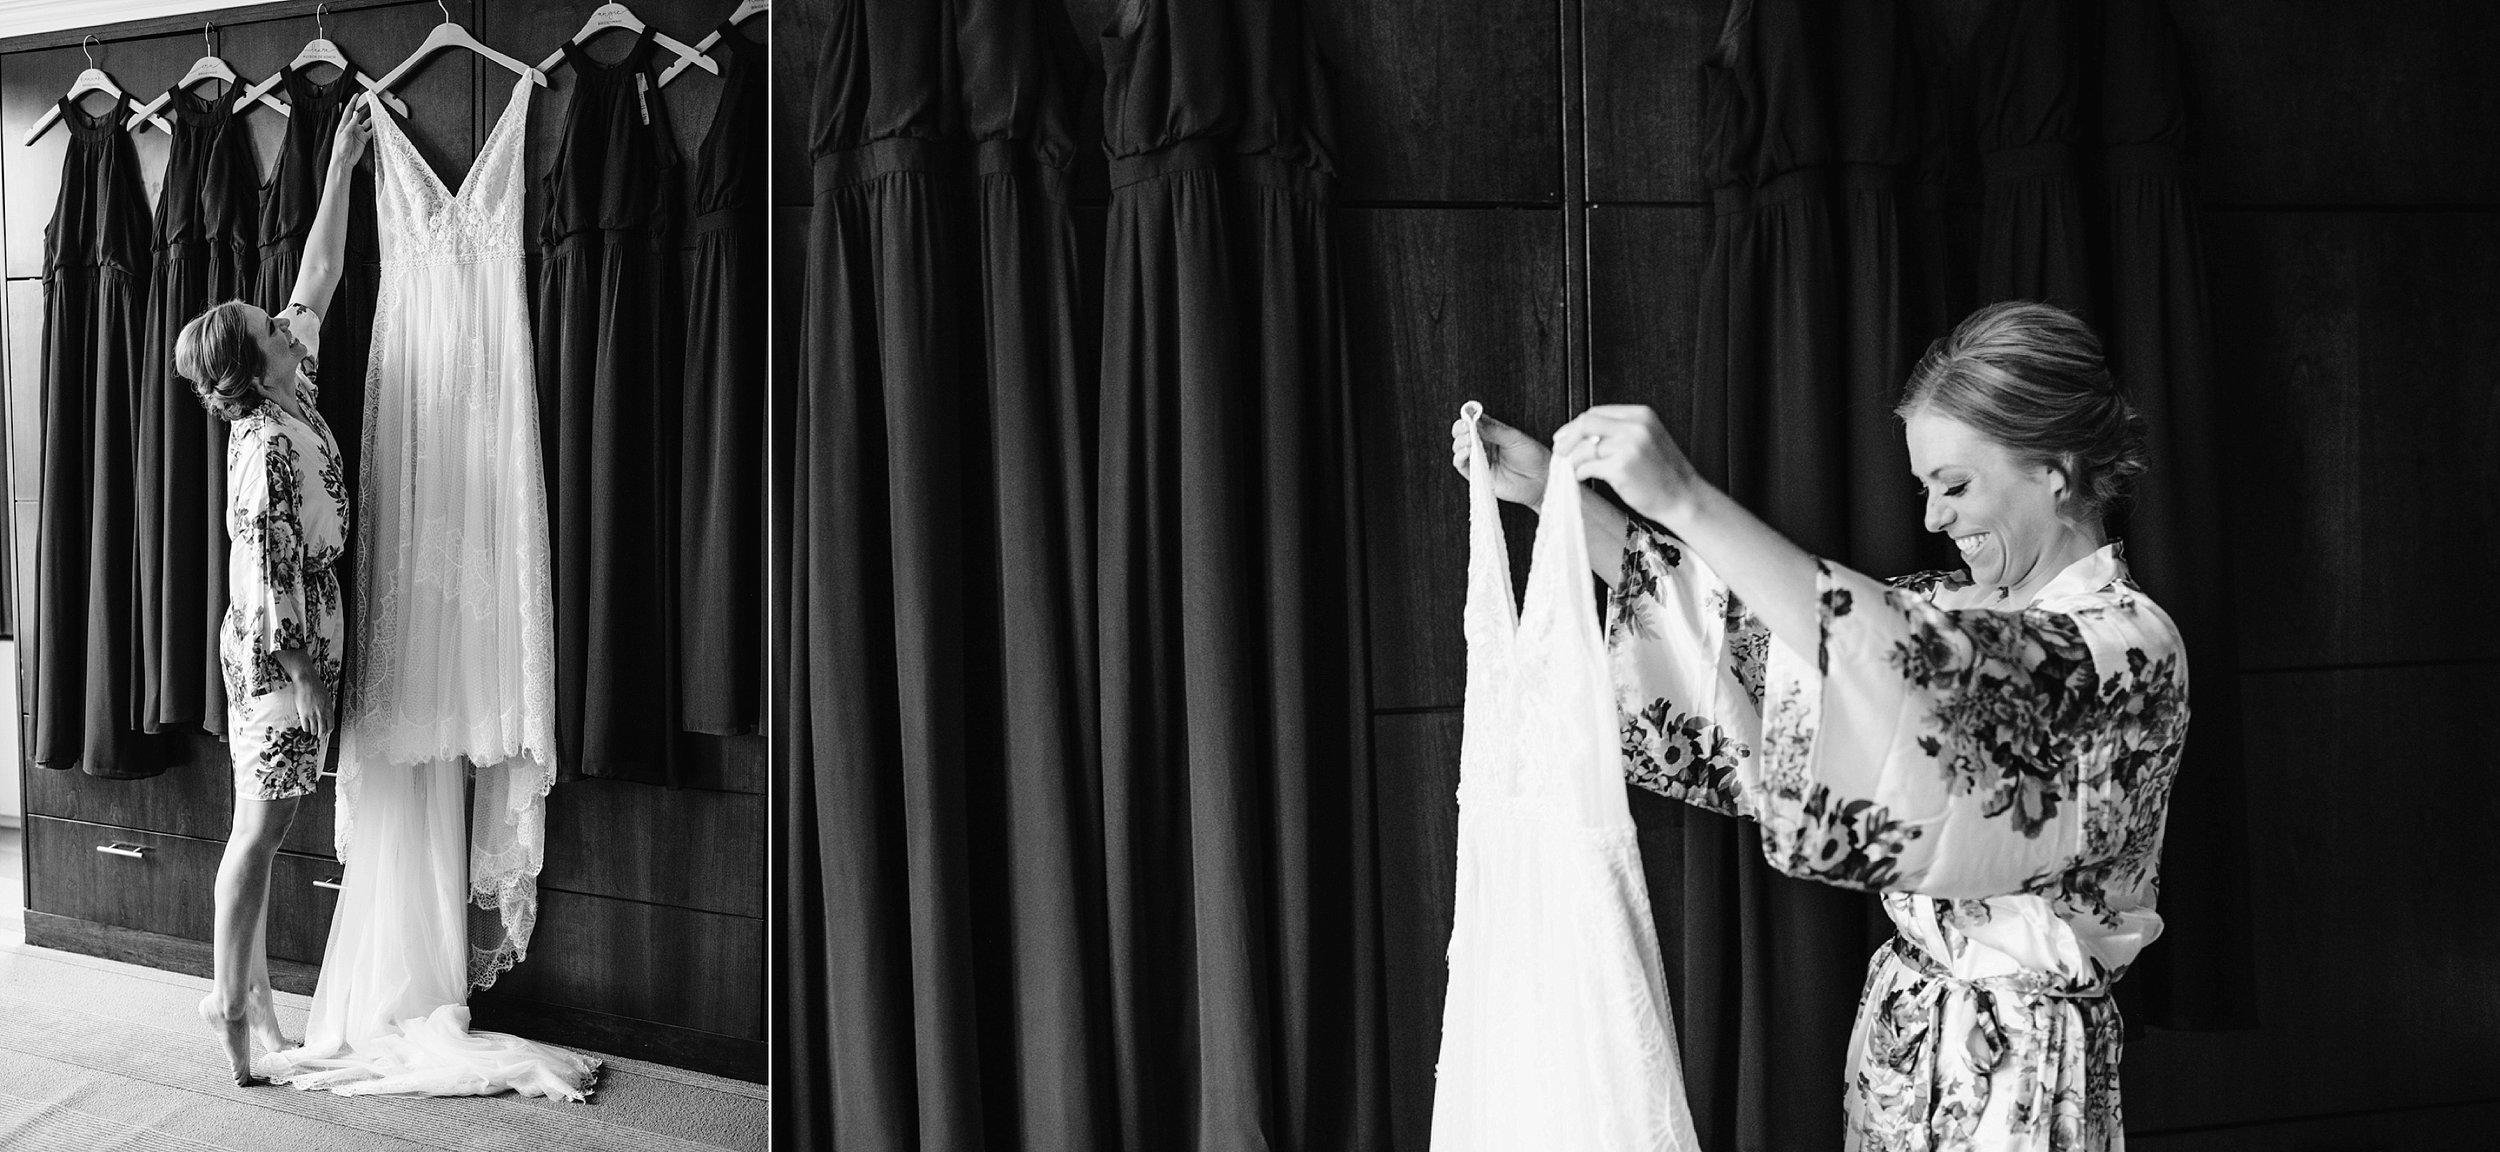 Nicollet-Island-Pavilion-Minneapolis-September-Coral-Navy-Wedding-10.jpg